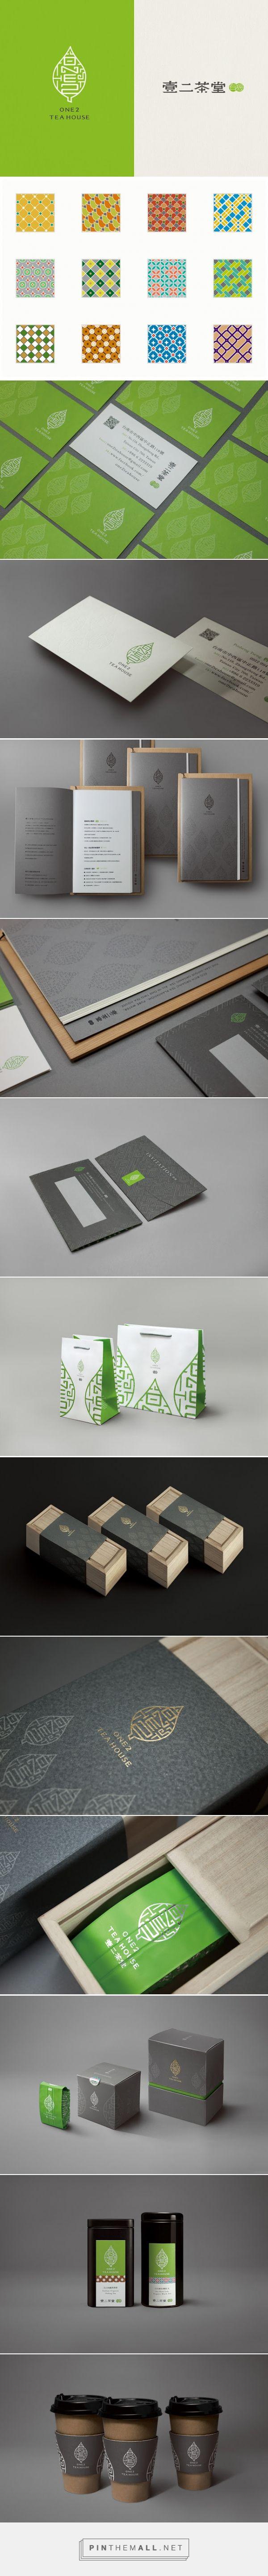 One2 Tea House packaging designed by Sump Design - http://www.packagingoftheworld.com/2015/08/one-2-tea-house.html